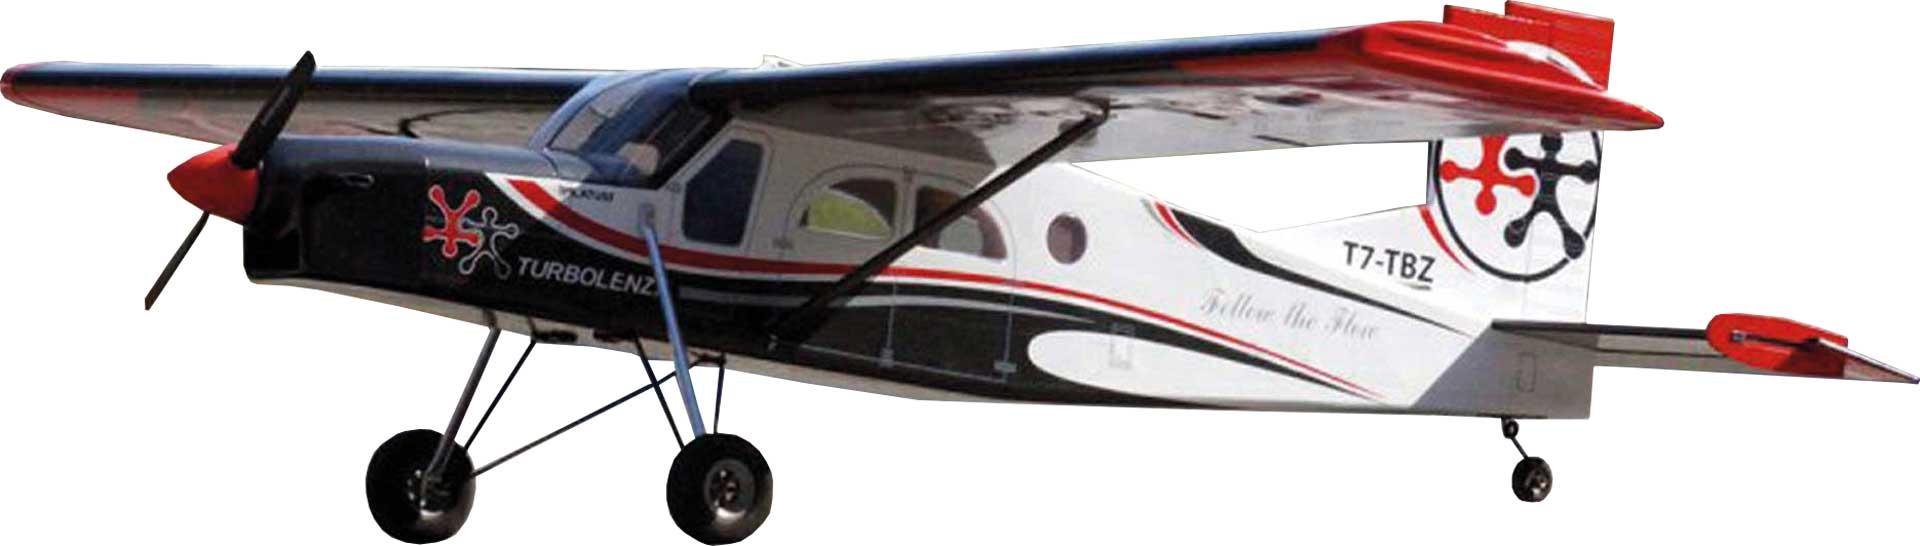 VQ MODELS PILATUS PORTER PC-6 TURBOLENZA ARF 1,58M